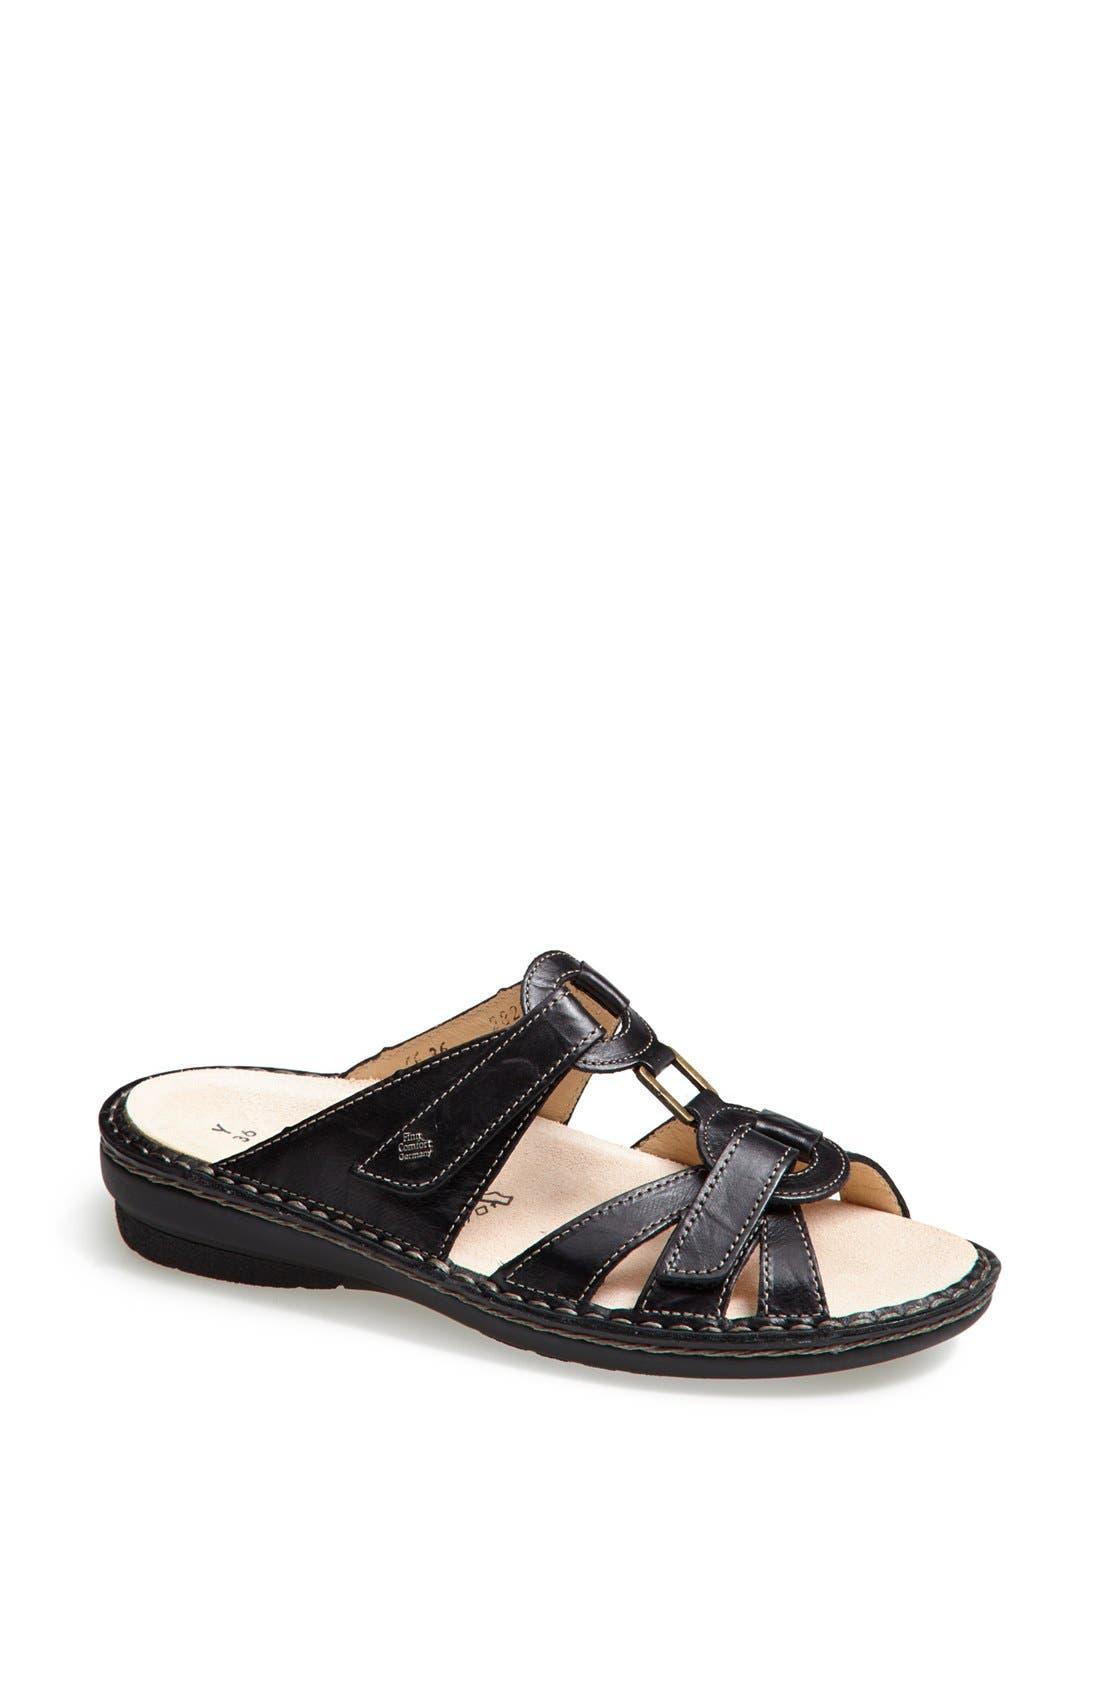 Main Image - Finn Comfort 'Cebu' Leather Sandal